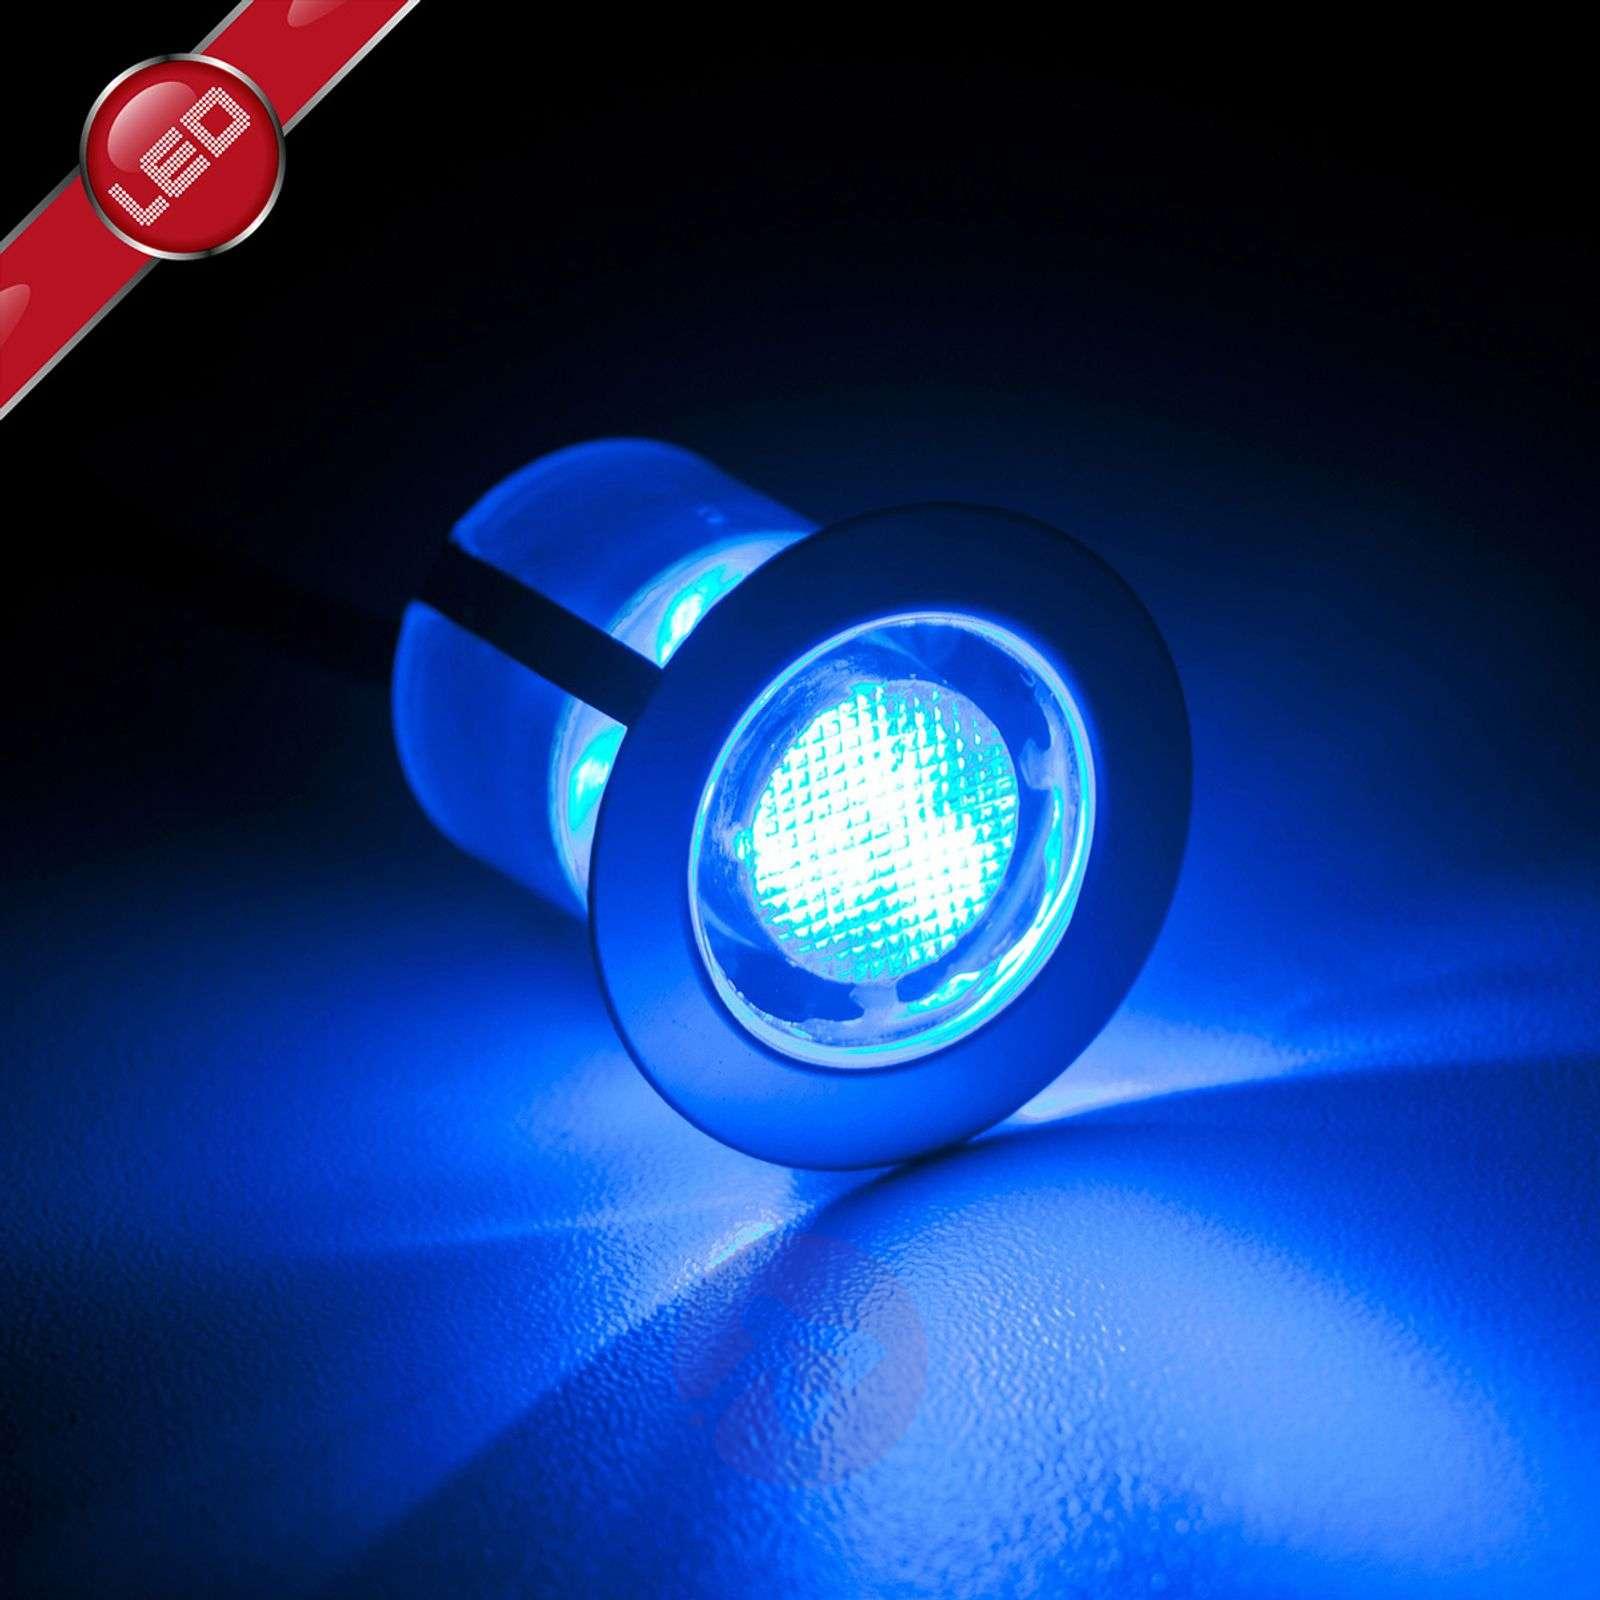 10 kpl:n setti Cosas-LED-uppovalaisimia, sininen-1507143-01